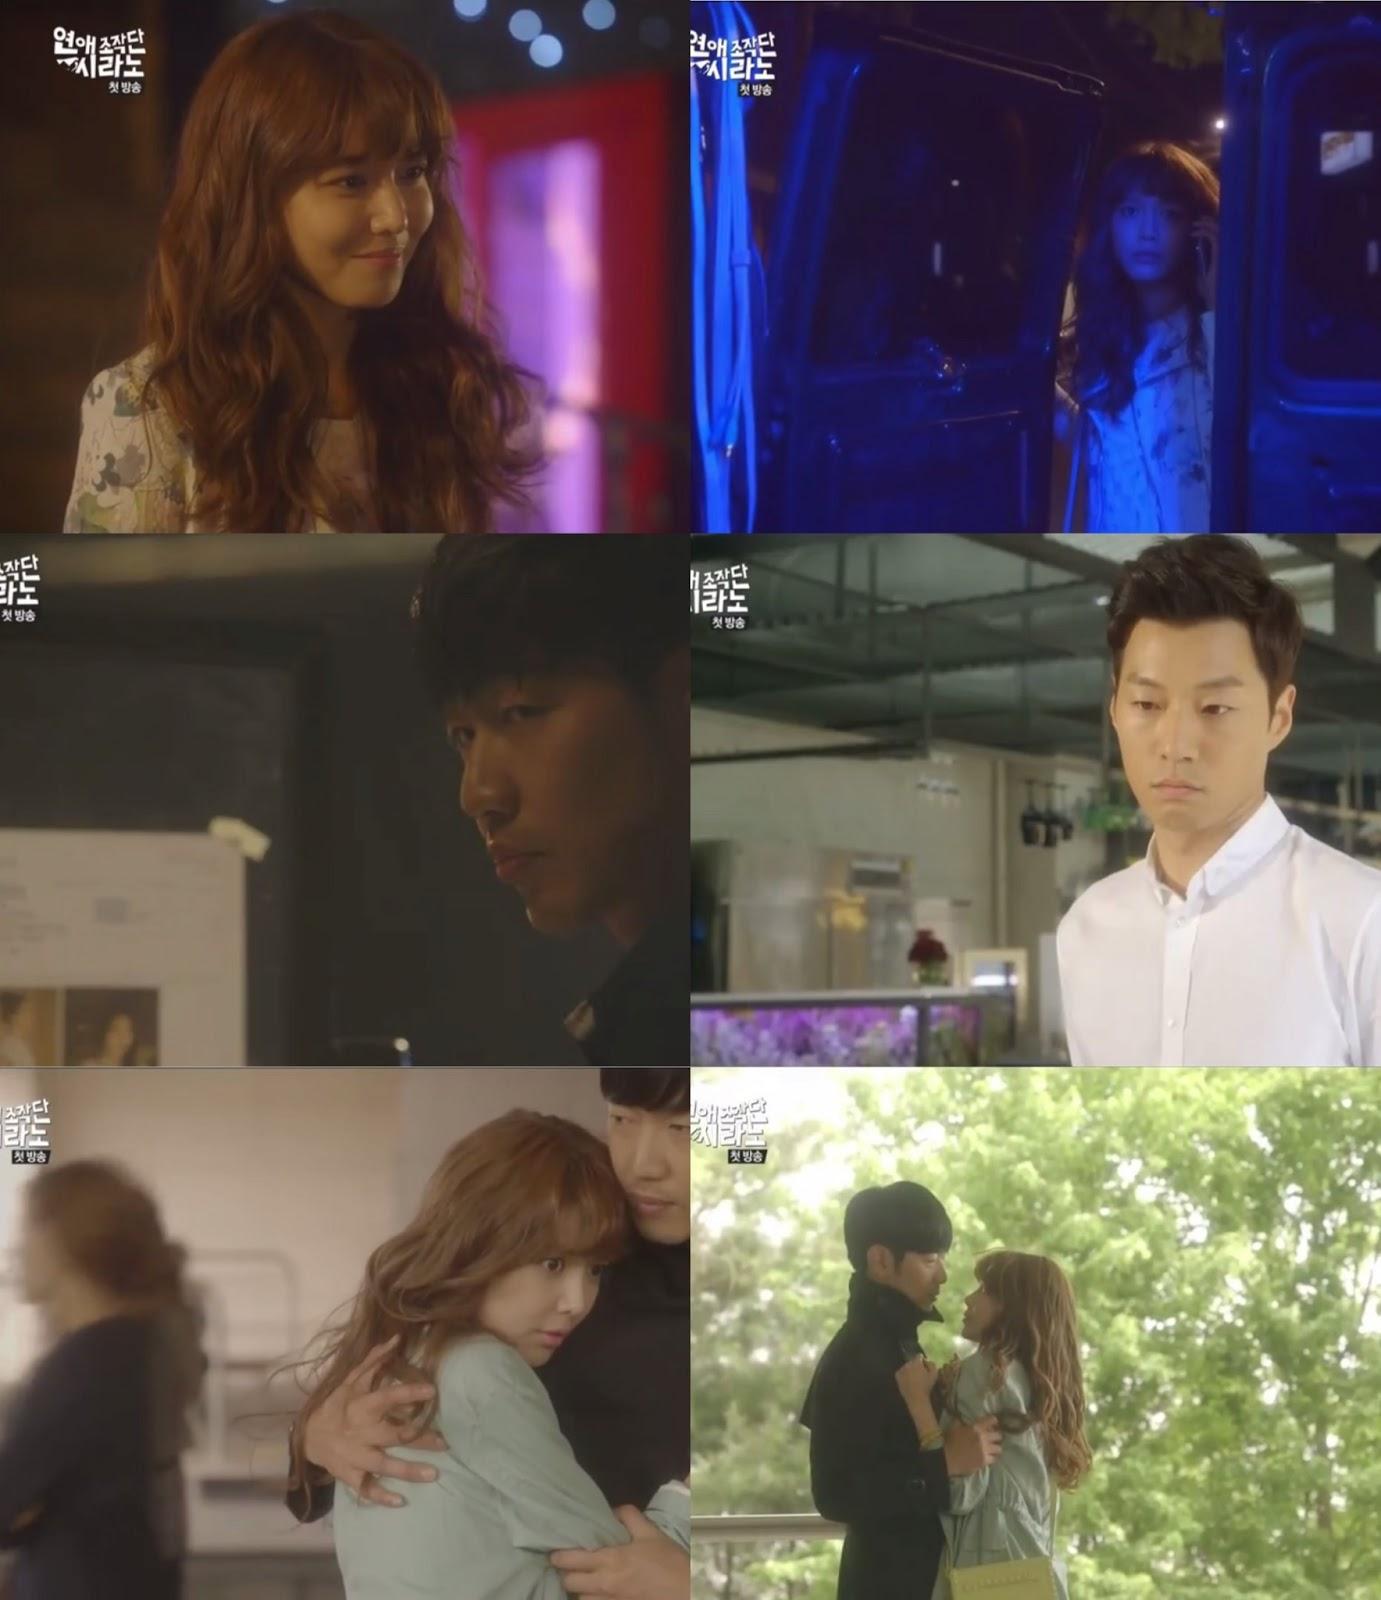 dating agency cyrano vostfr 01 Dating agency cyrano vostfr 2013 drama coréen streaming drama | corée du sud titre alternatif : 연애조작단:시라노 (ggotminam, yeonaejojakdan) / dat.